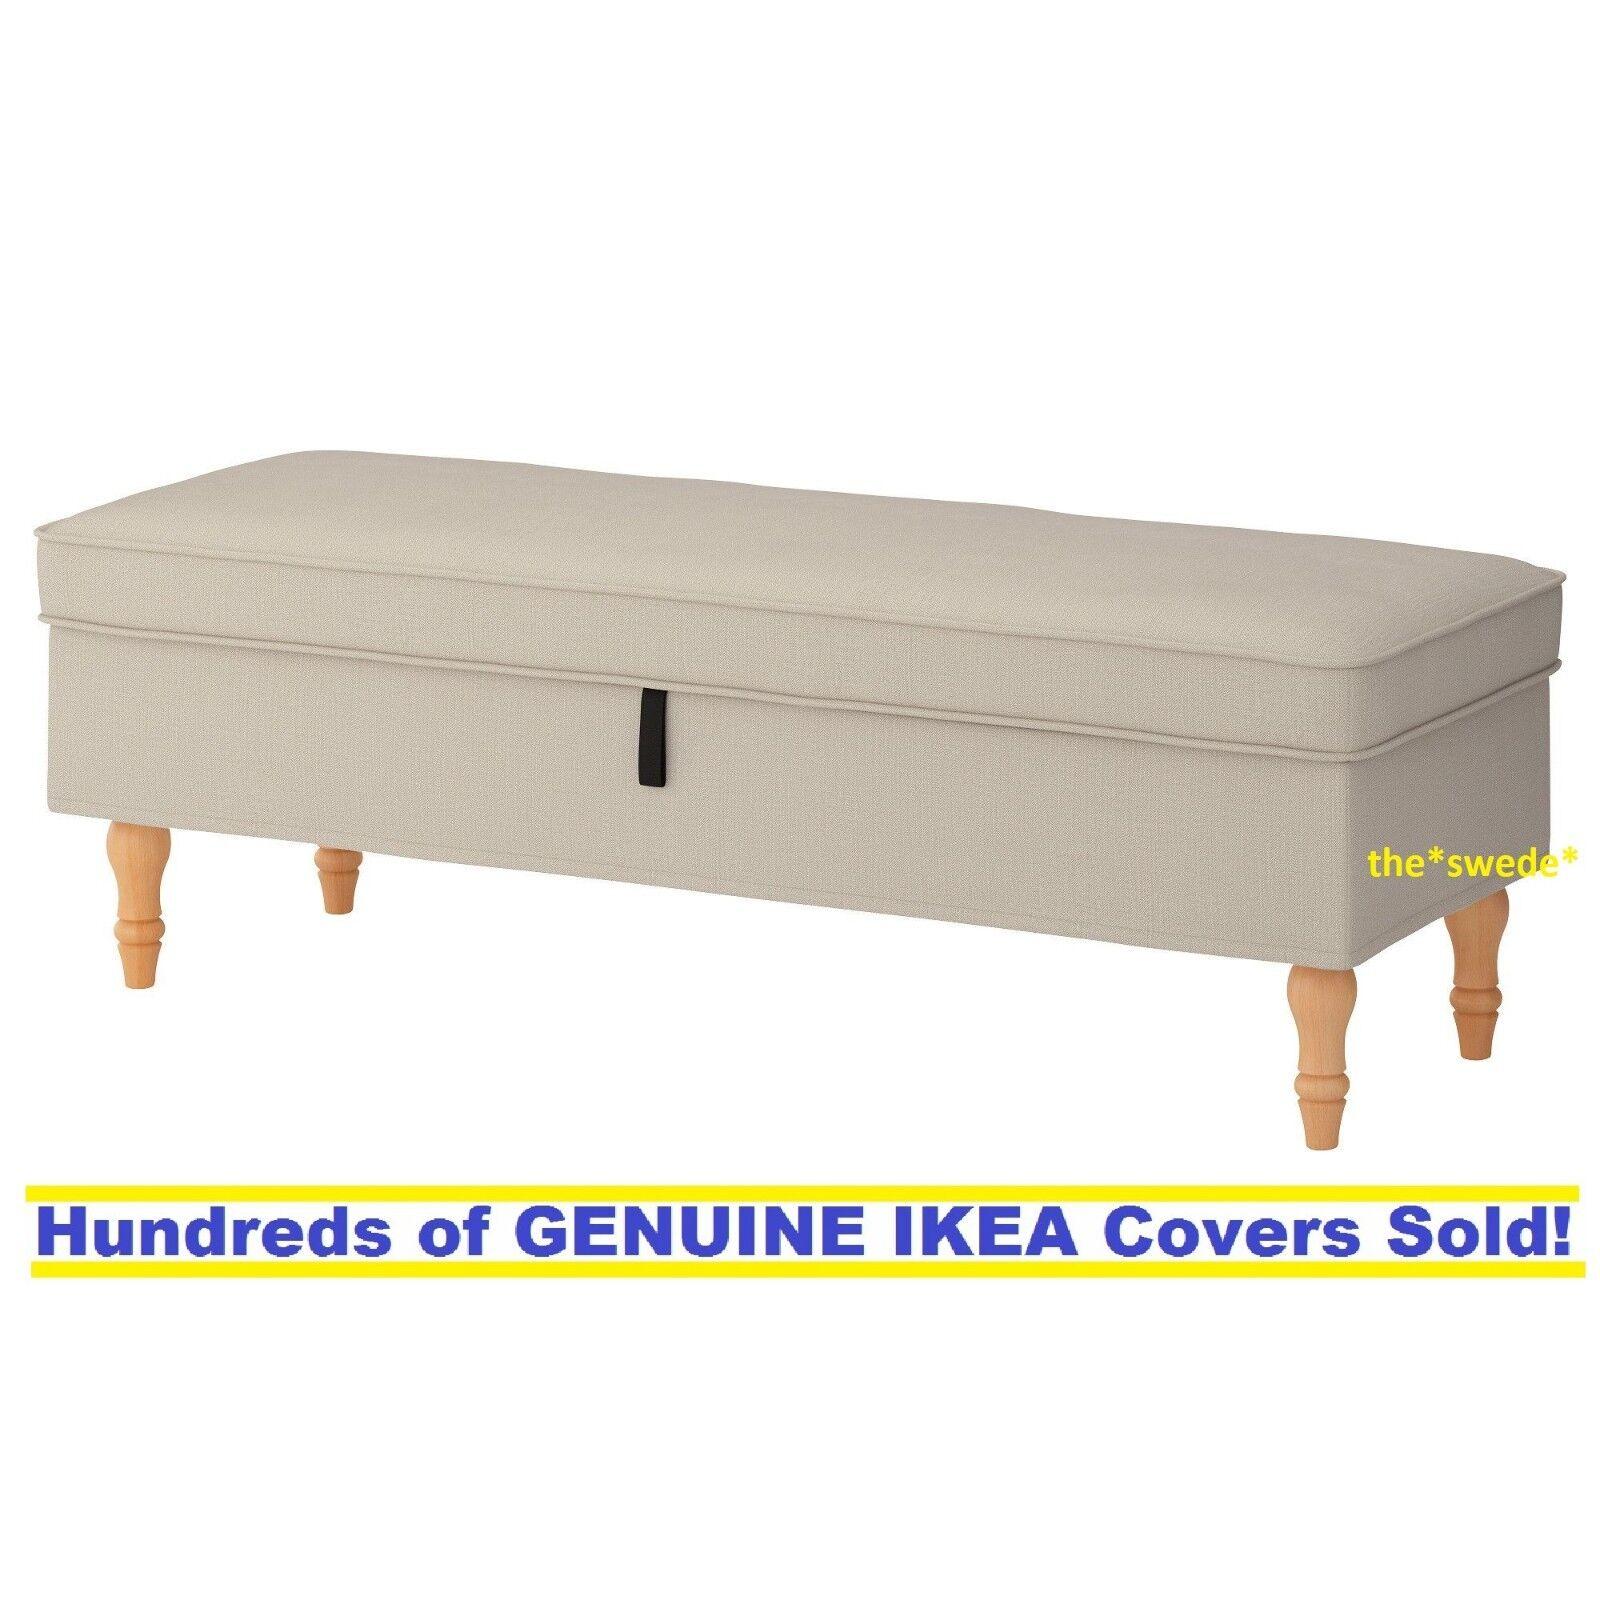 Ikea STOCKSUND Bench  Cover Slipcover NOLHAGA LIGHT BEIGE Ne